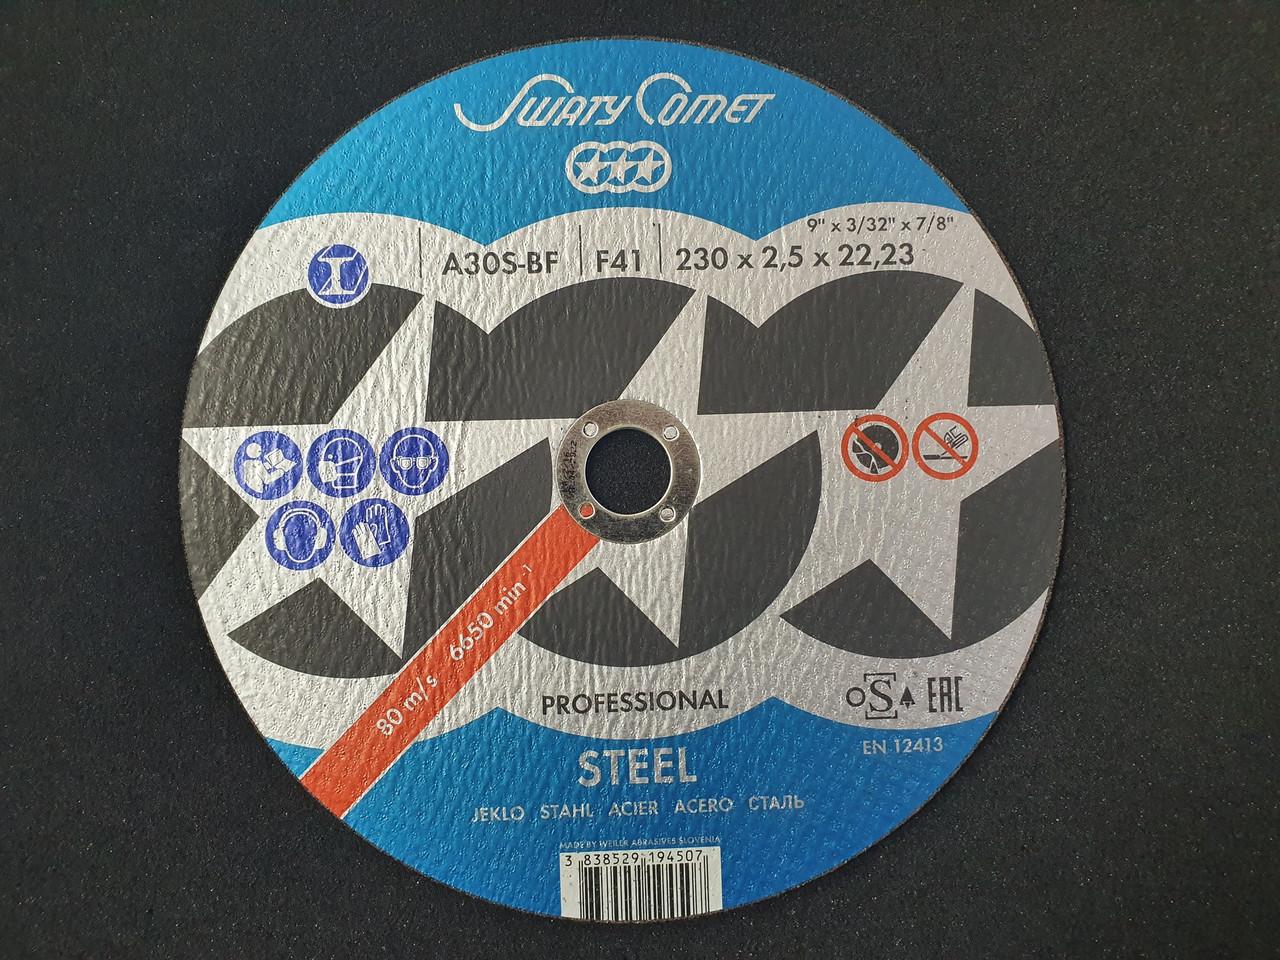 Круг отрезной Metal 230 х 2,5 х 22,23 SwatyComet A30S-BF (Weiler Abrasives, Slovenija)